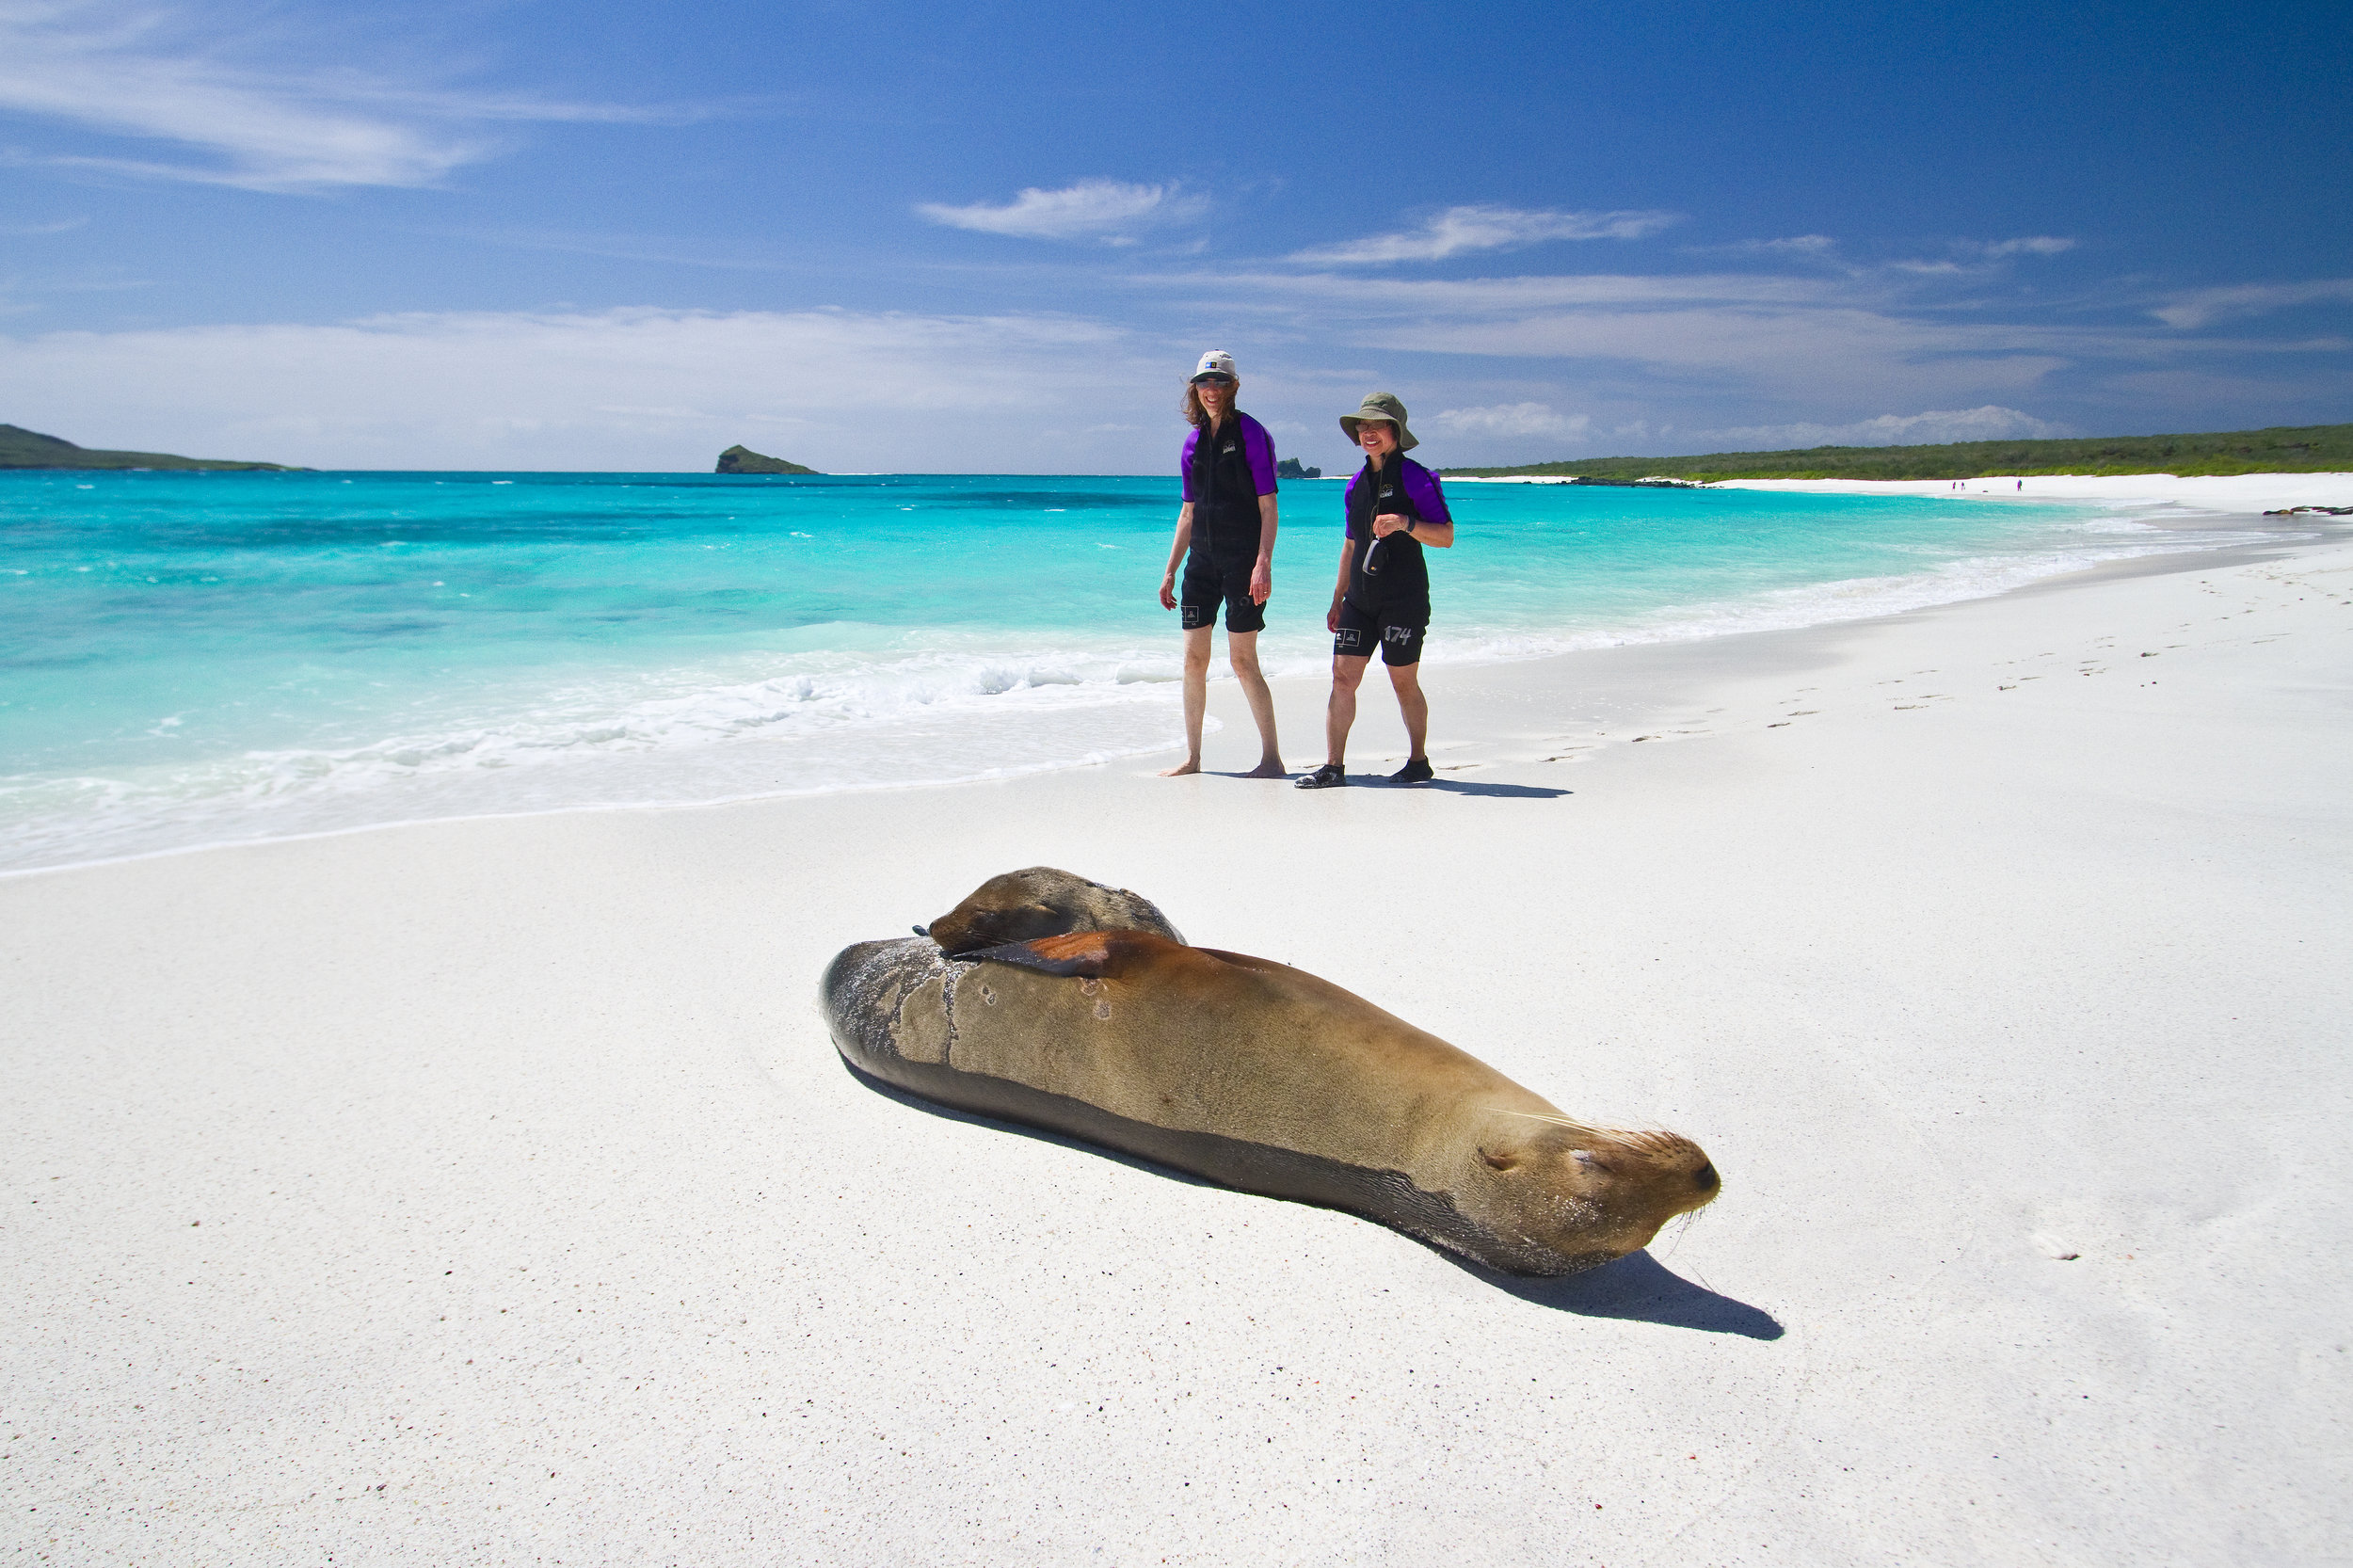 Copy of Copy of Galapagos Sea Lion (Zalophus wollebaeki)